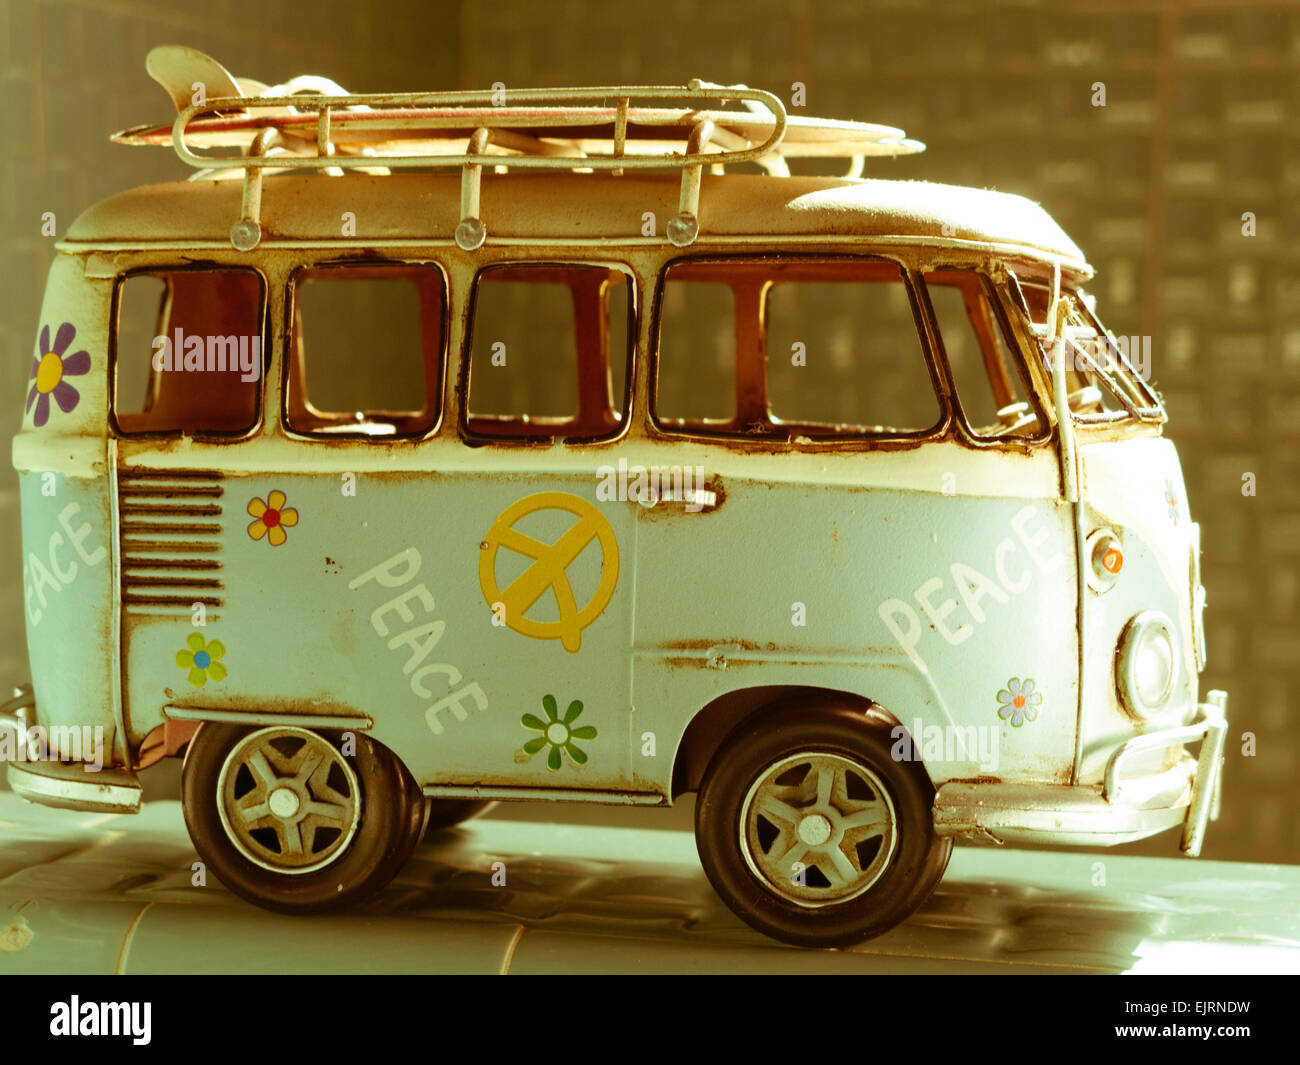 vintage vw hippie bus model stock photo 80427029 alamy. Black Bedroom Furniture Sets. Home Design Ideas